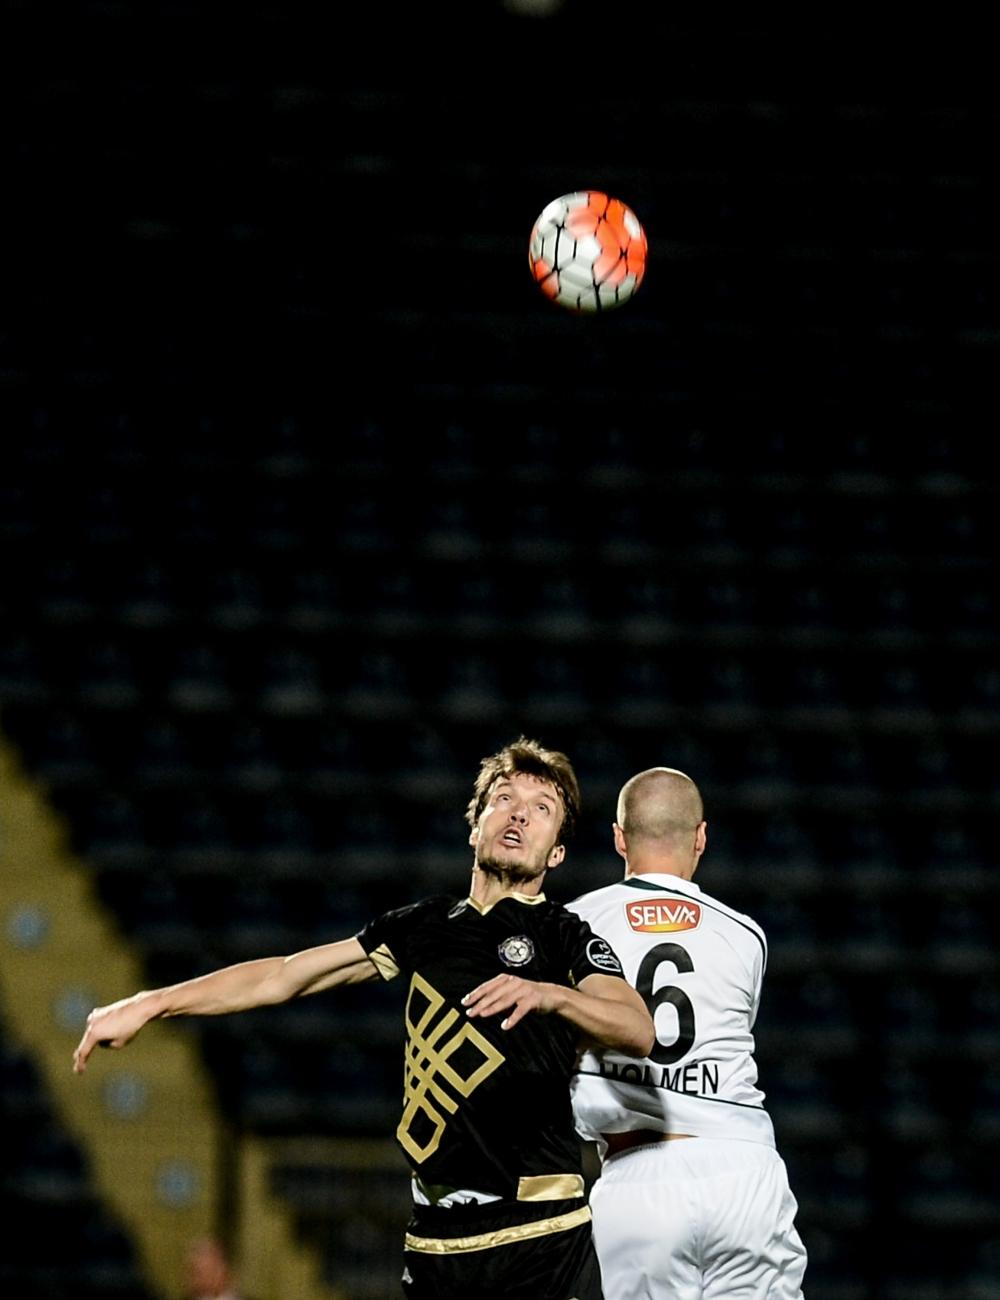 Osmanlıspor-Torku Konyaspor: 1-2 5